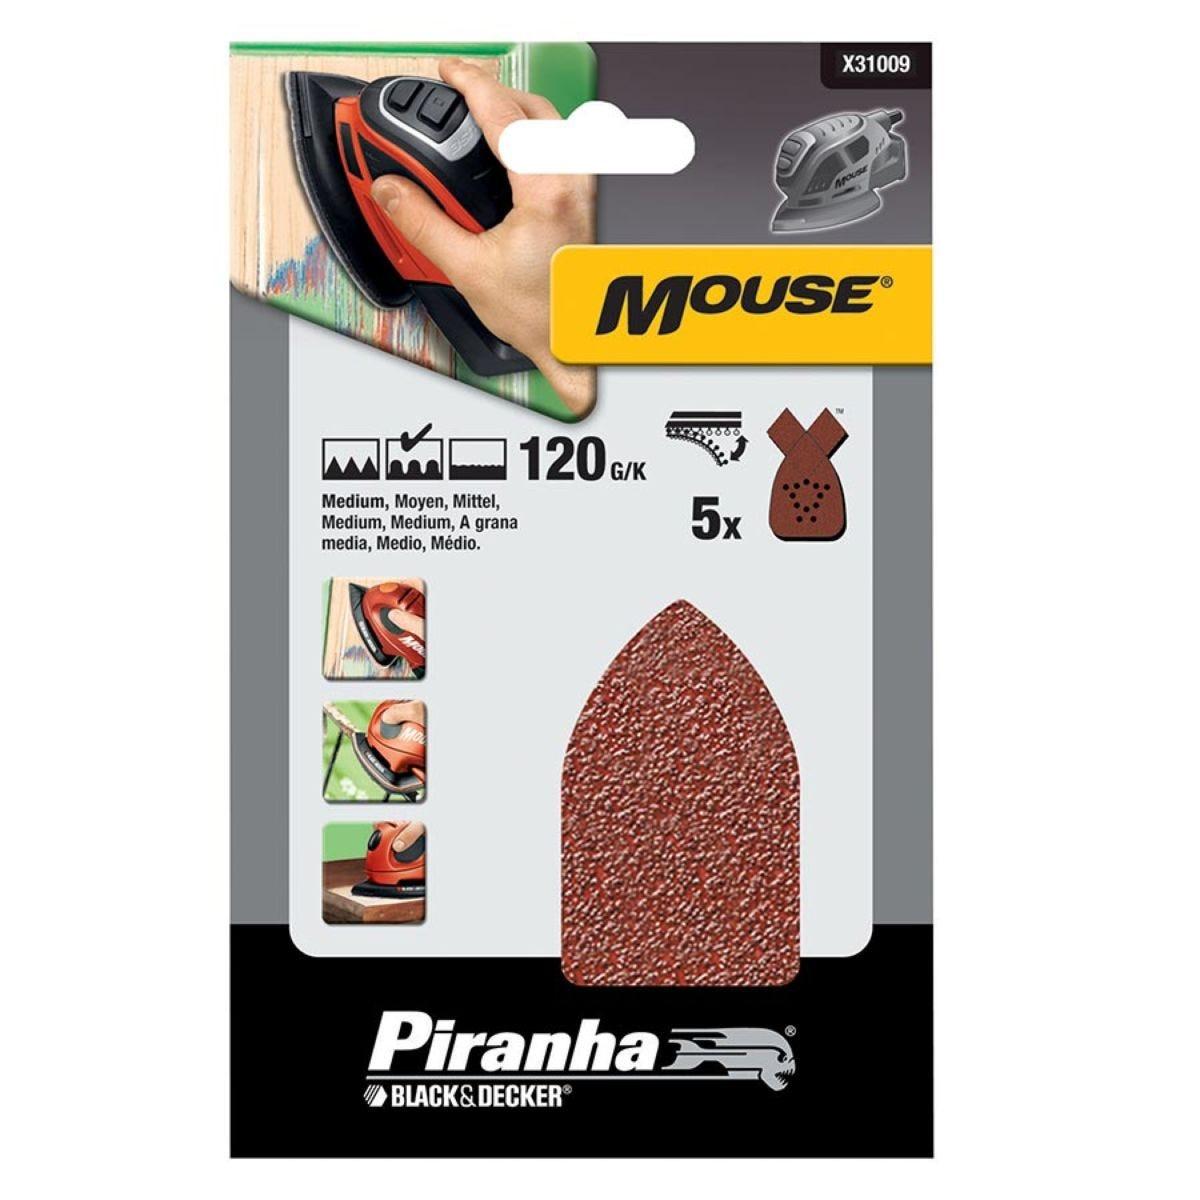 Black & Decker Mouse Sanding Sheets – Pack of 5, 120g